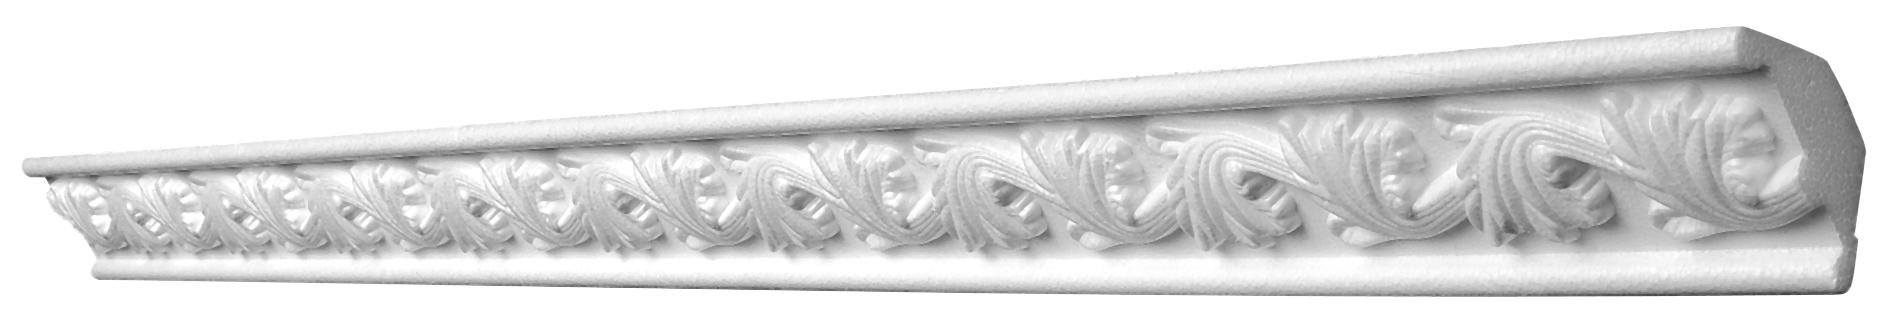 Baghete decorative Decosa- G27 (31x31mm)x70buc cod 7543 davopro 2021